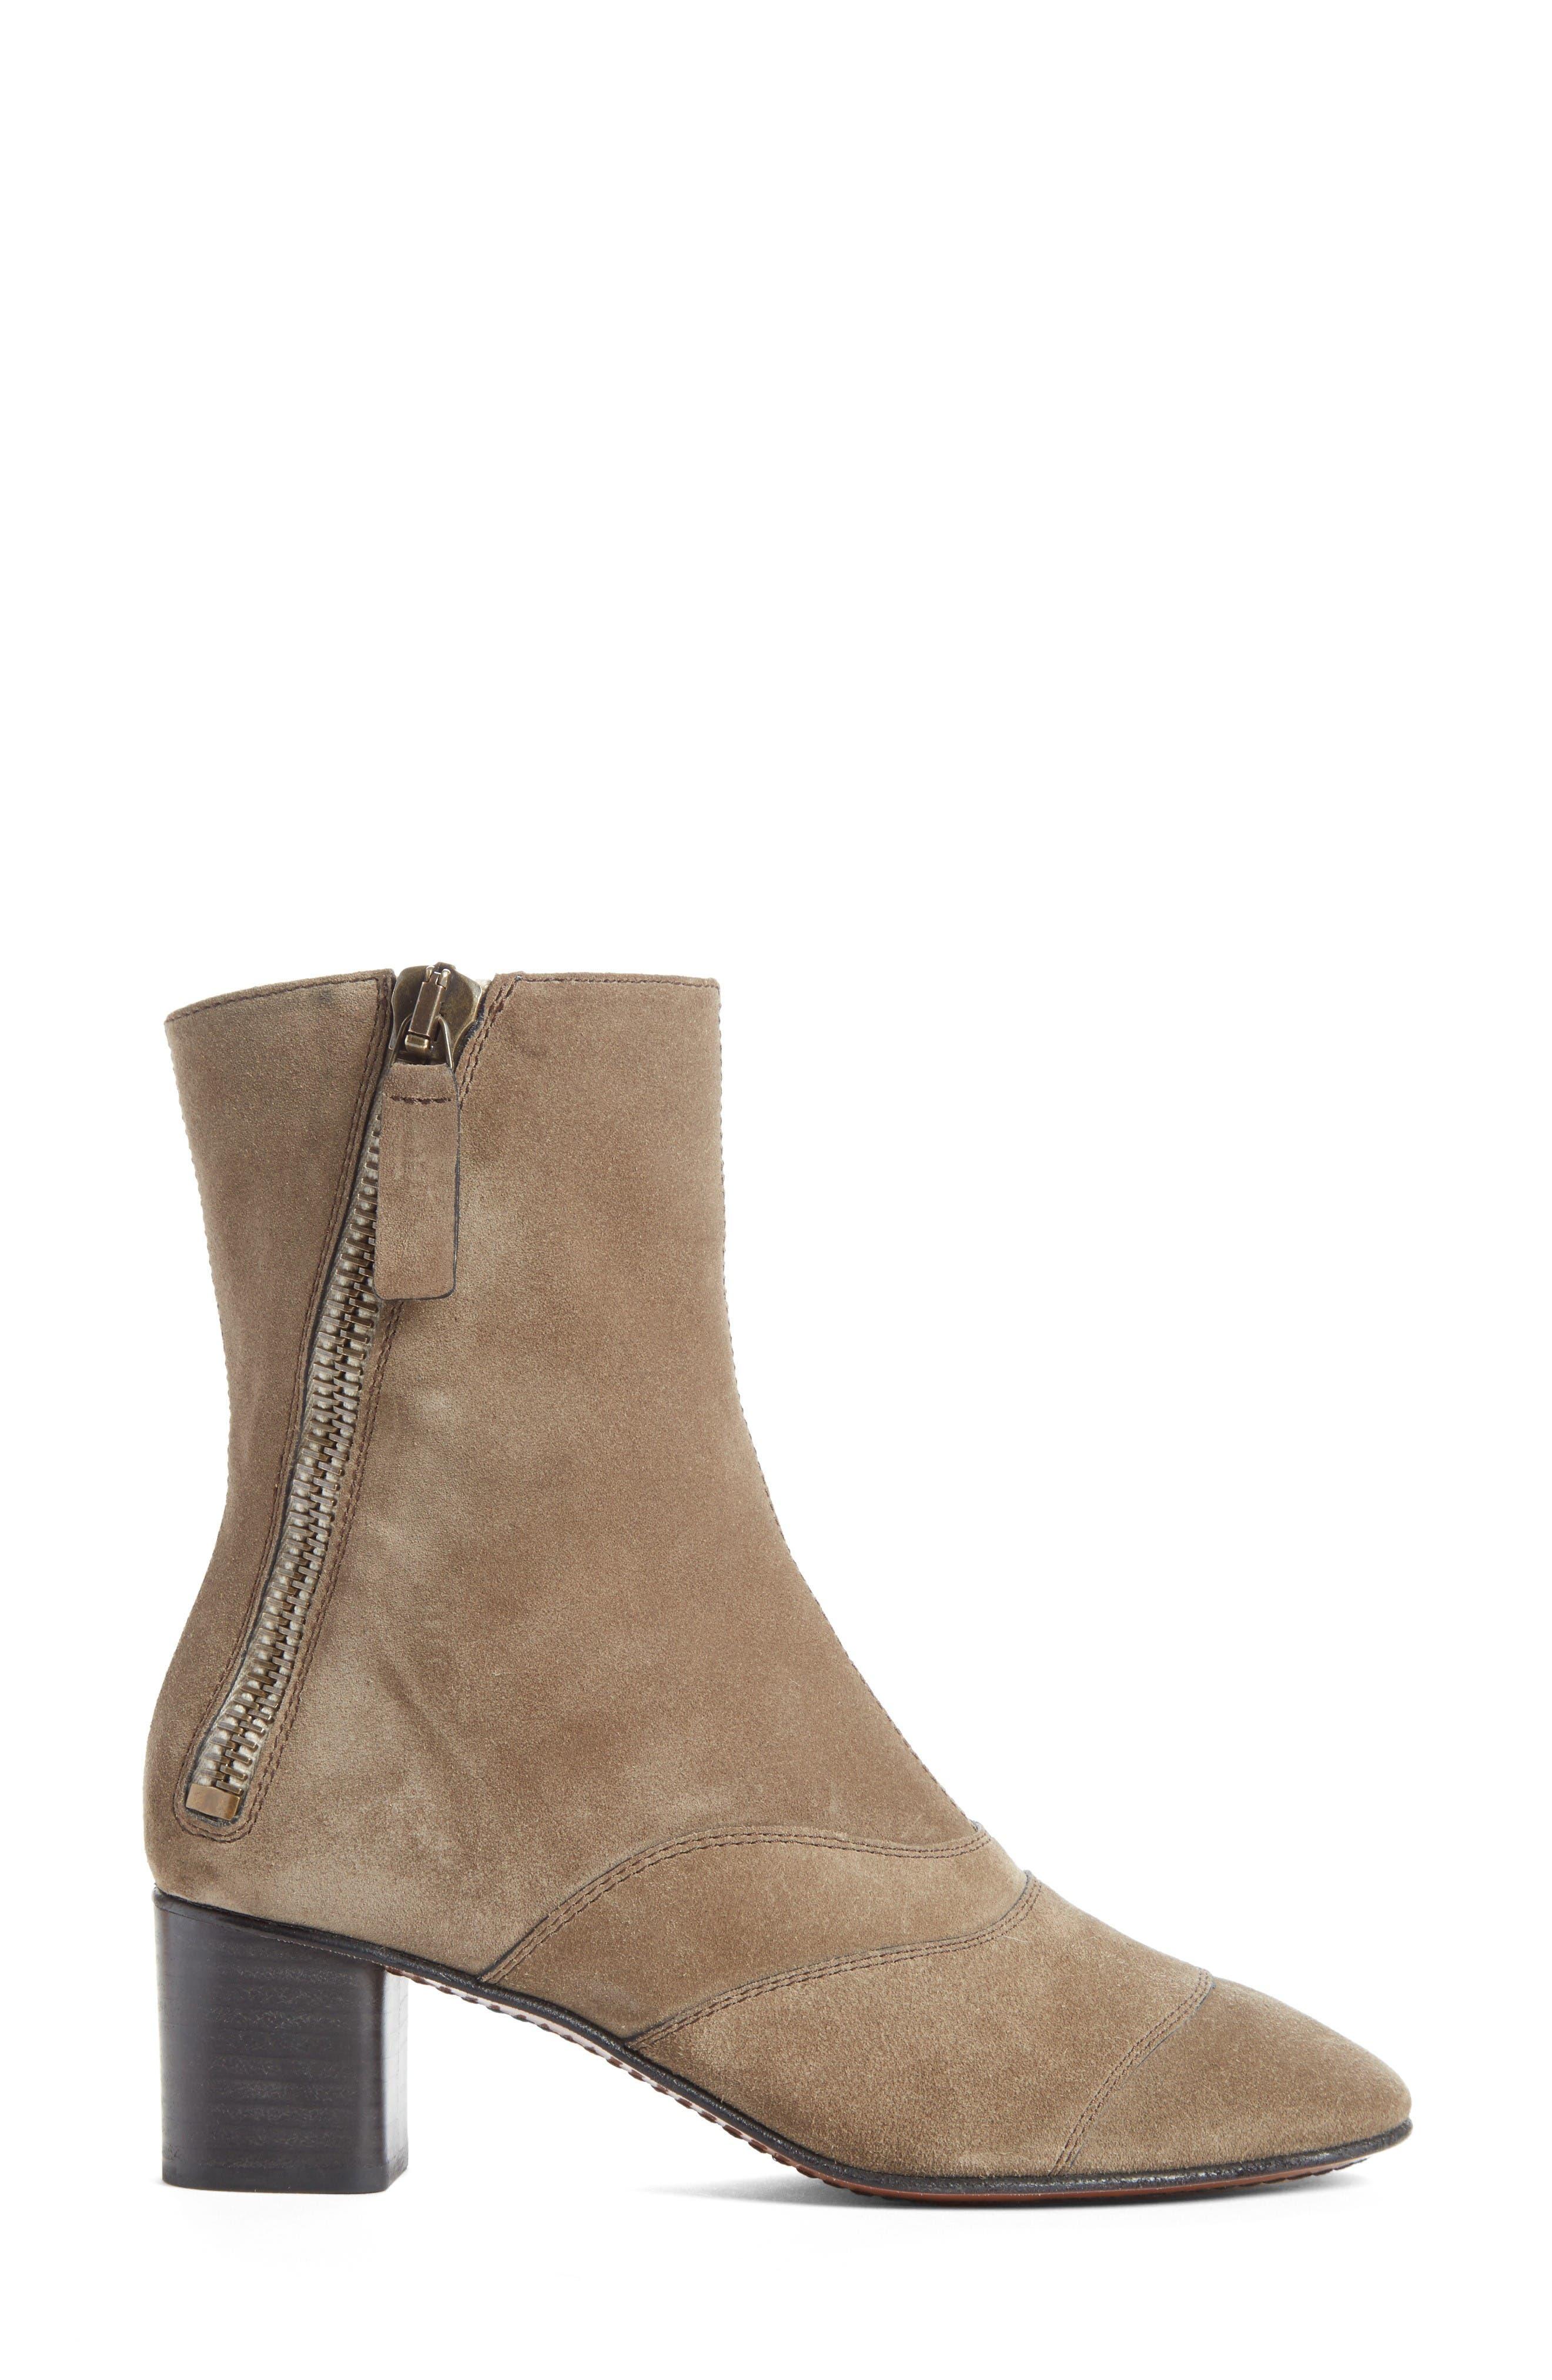 Lexie Block Heel Boot,                             Alternate thumbnail 4, color,                             Dark Greige